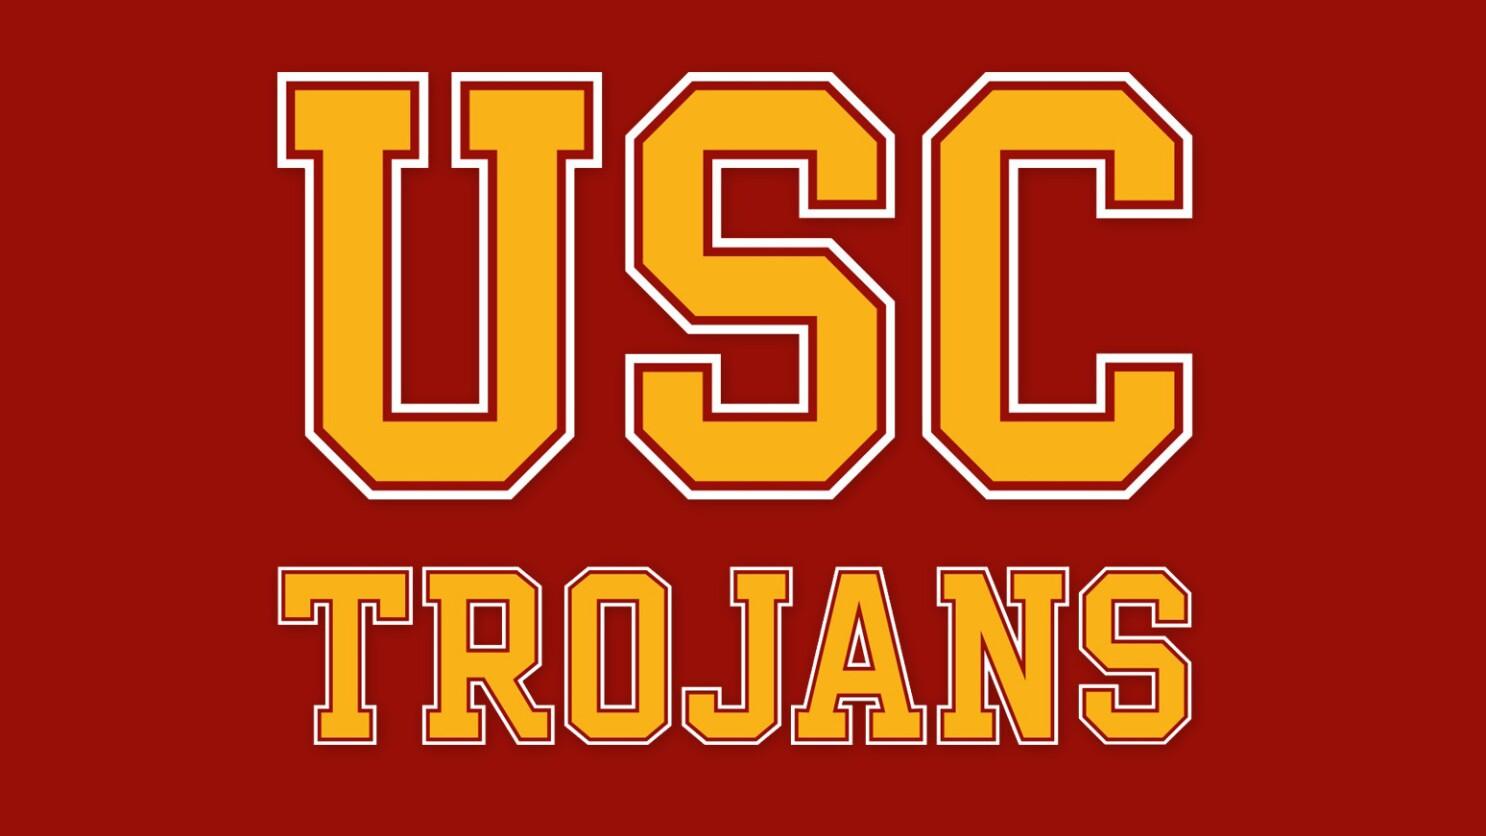 USC Trojans hire swim coach Jeremy Kipp via Zoom - Los Angeles Times